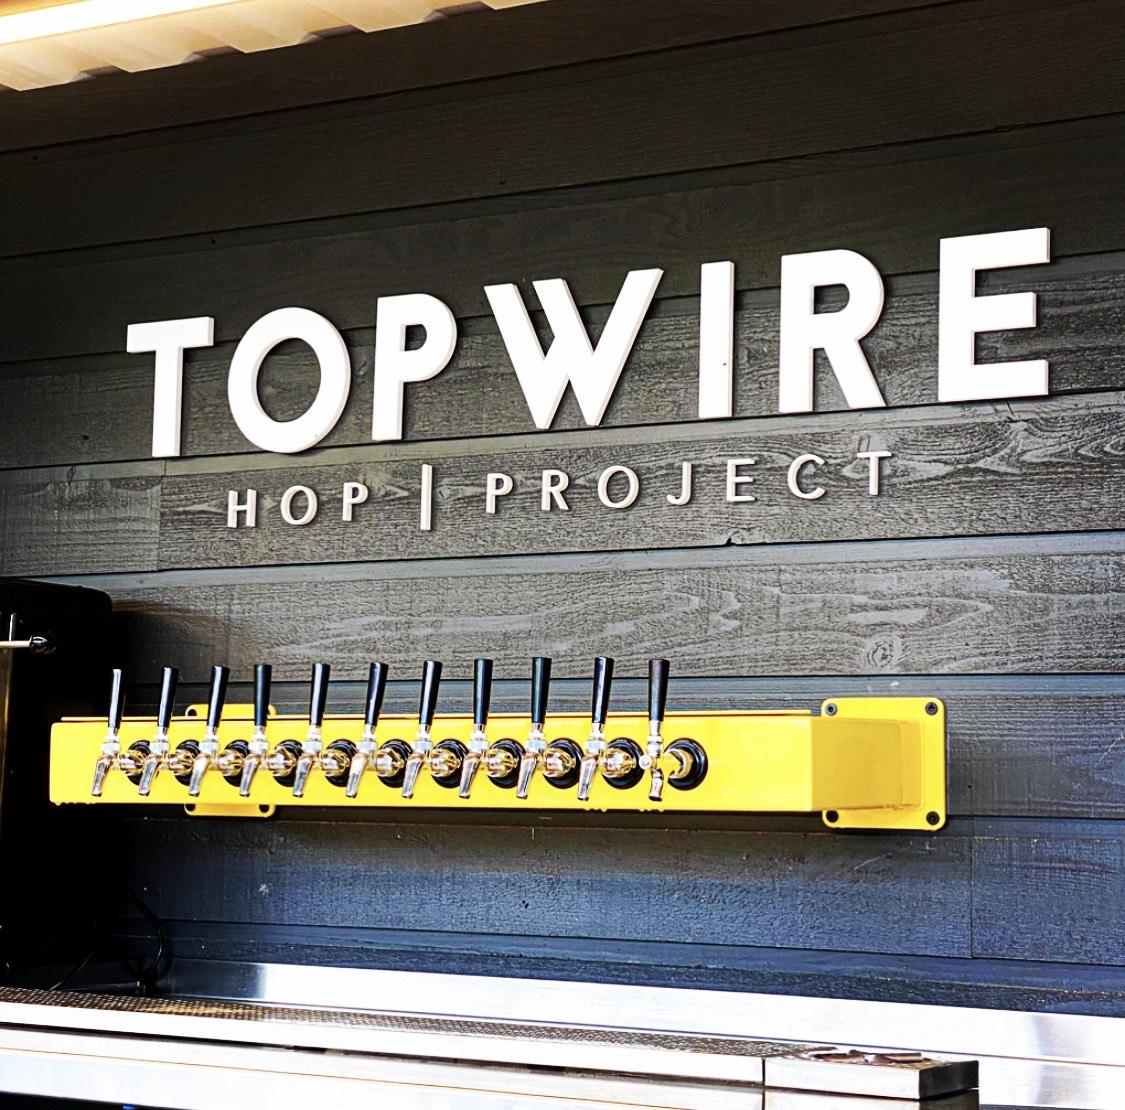 Jenna Steward TopWire Hop Project / Crosby Hops – Craft Beer Podcast Episode 121 by Steven Shomler